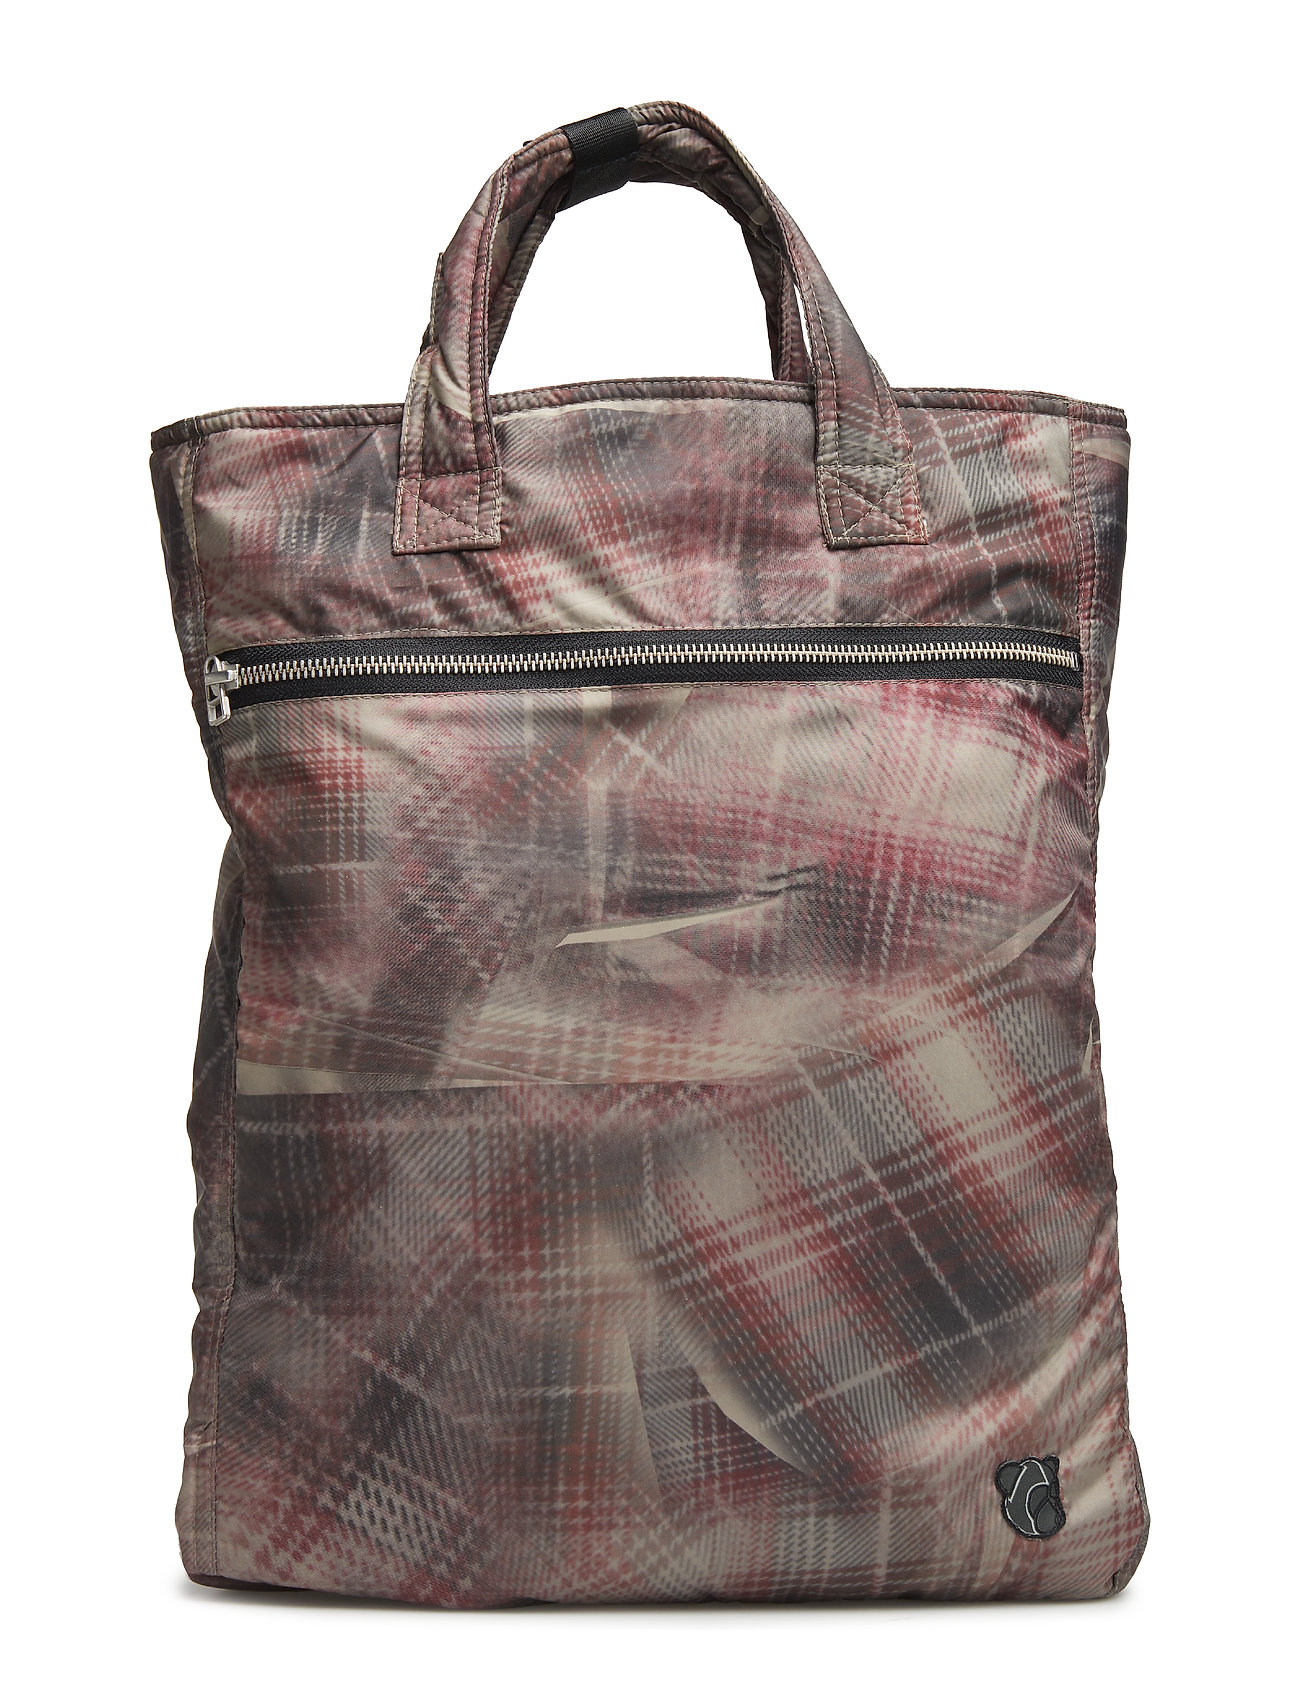 Tonsure Tote bag - CRUNCHED CHECK PRINT